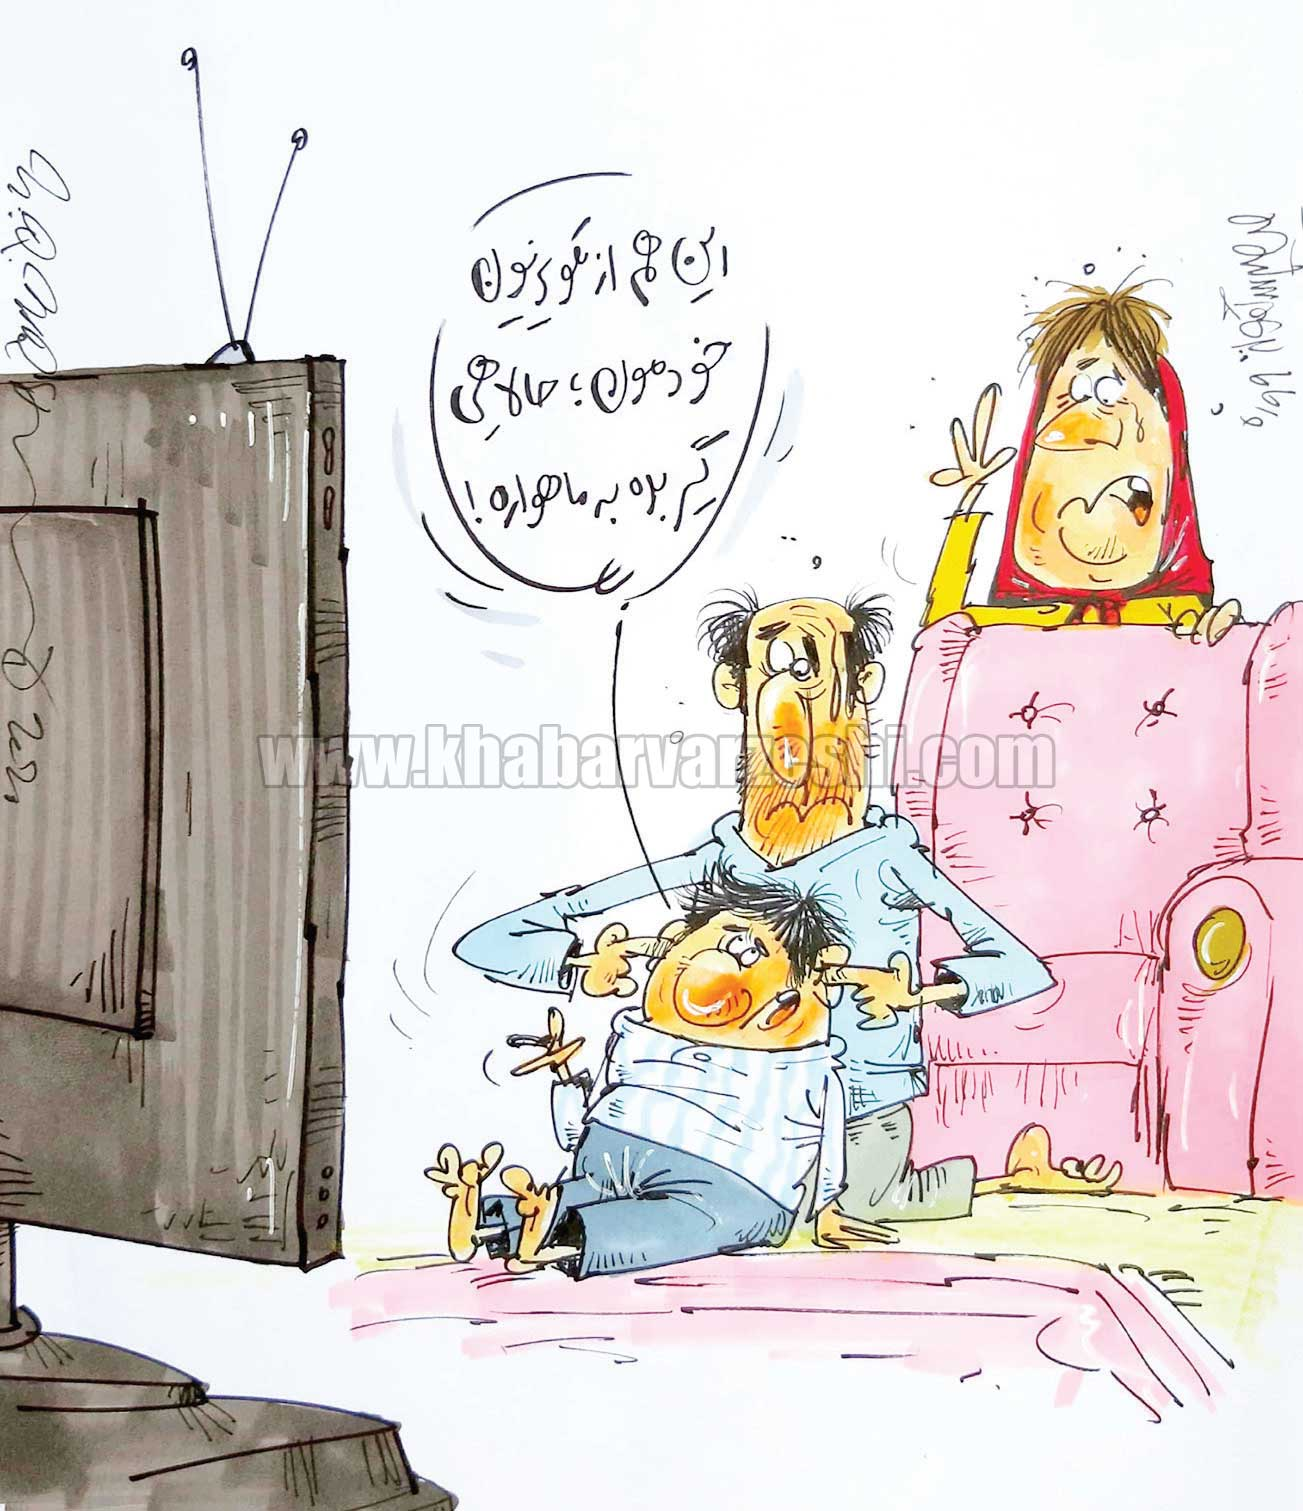 کارتون محمدرضا میرشاهولد درباره شوخی مجری تلویزیون